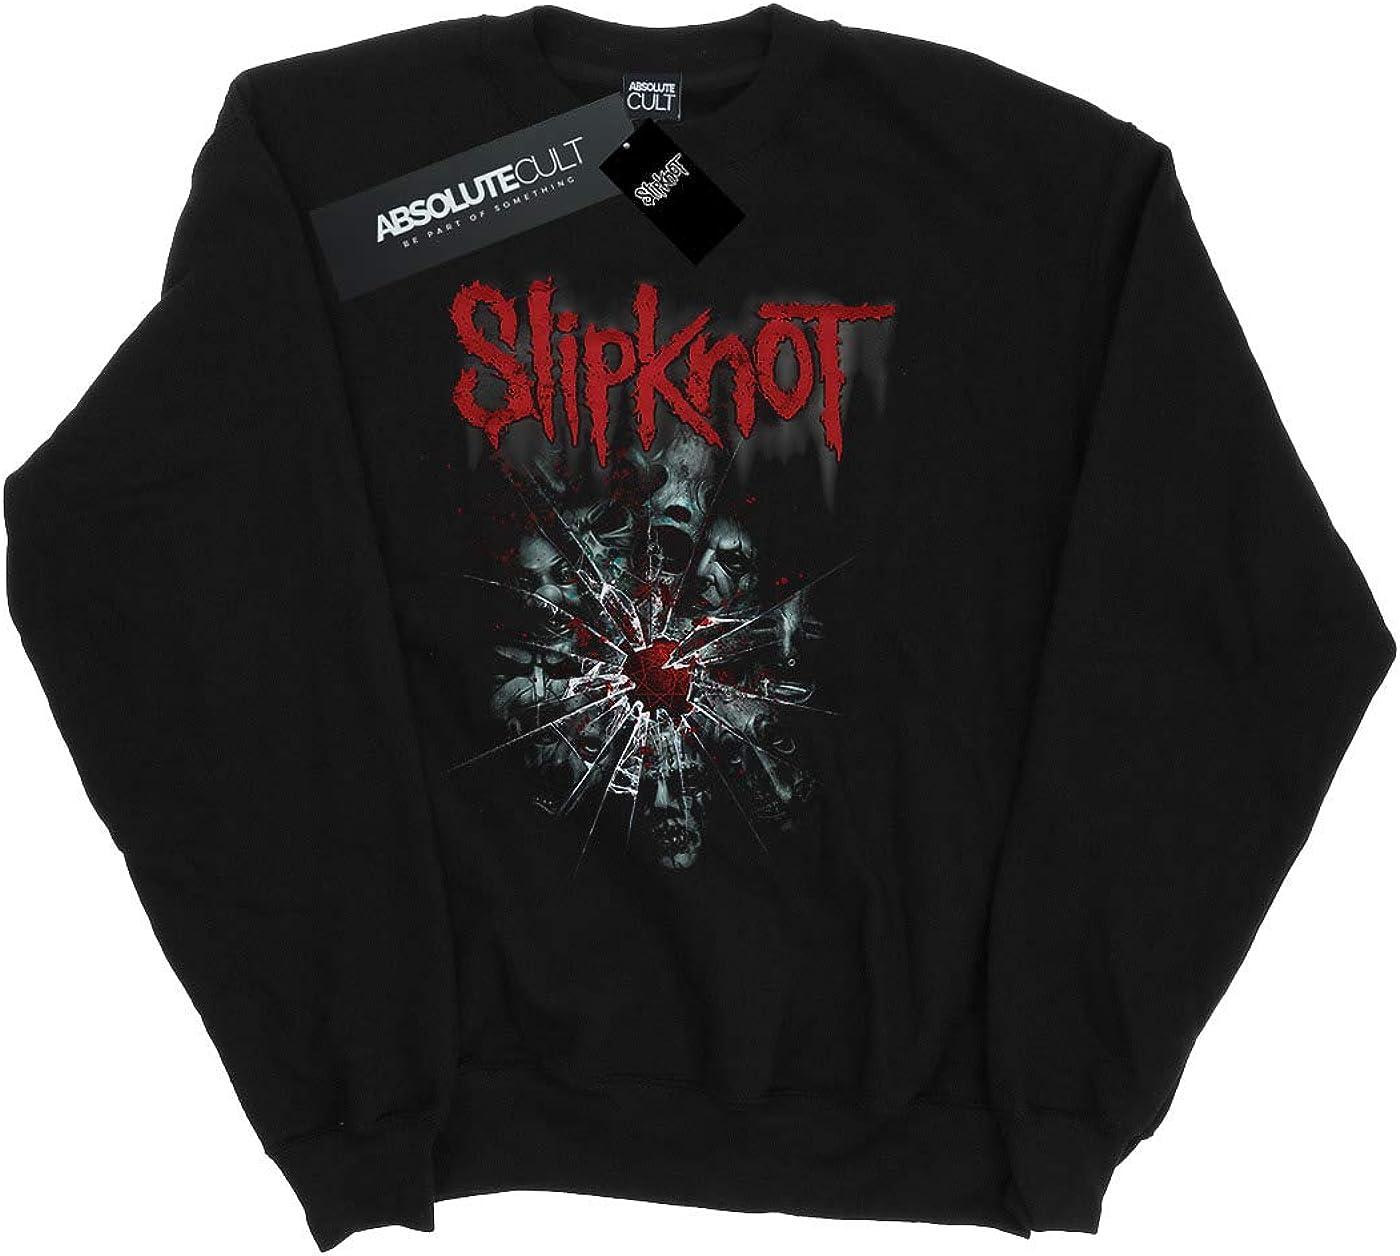 Absolute Cult Slipknot Mujer Shattered Glass Camisa De Entrenamiento